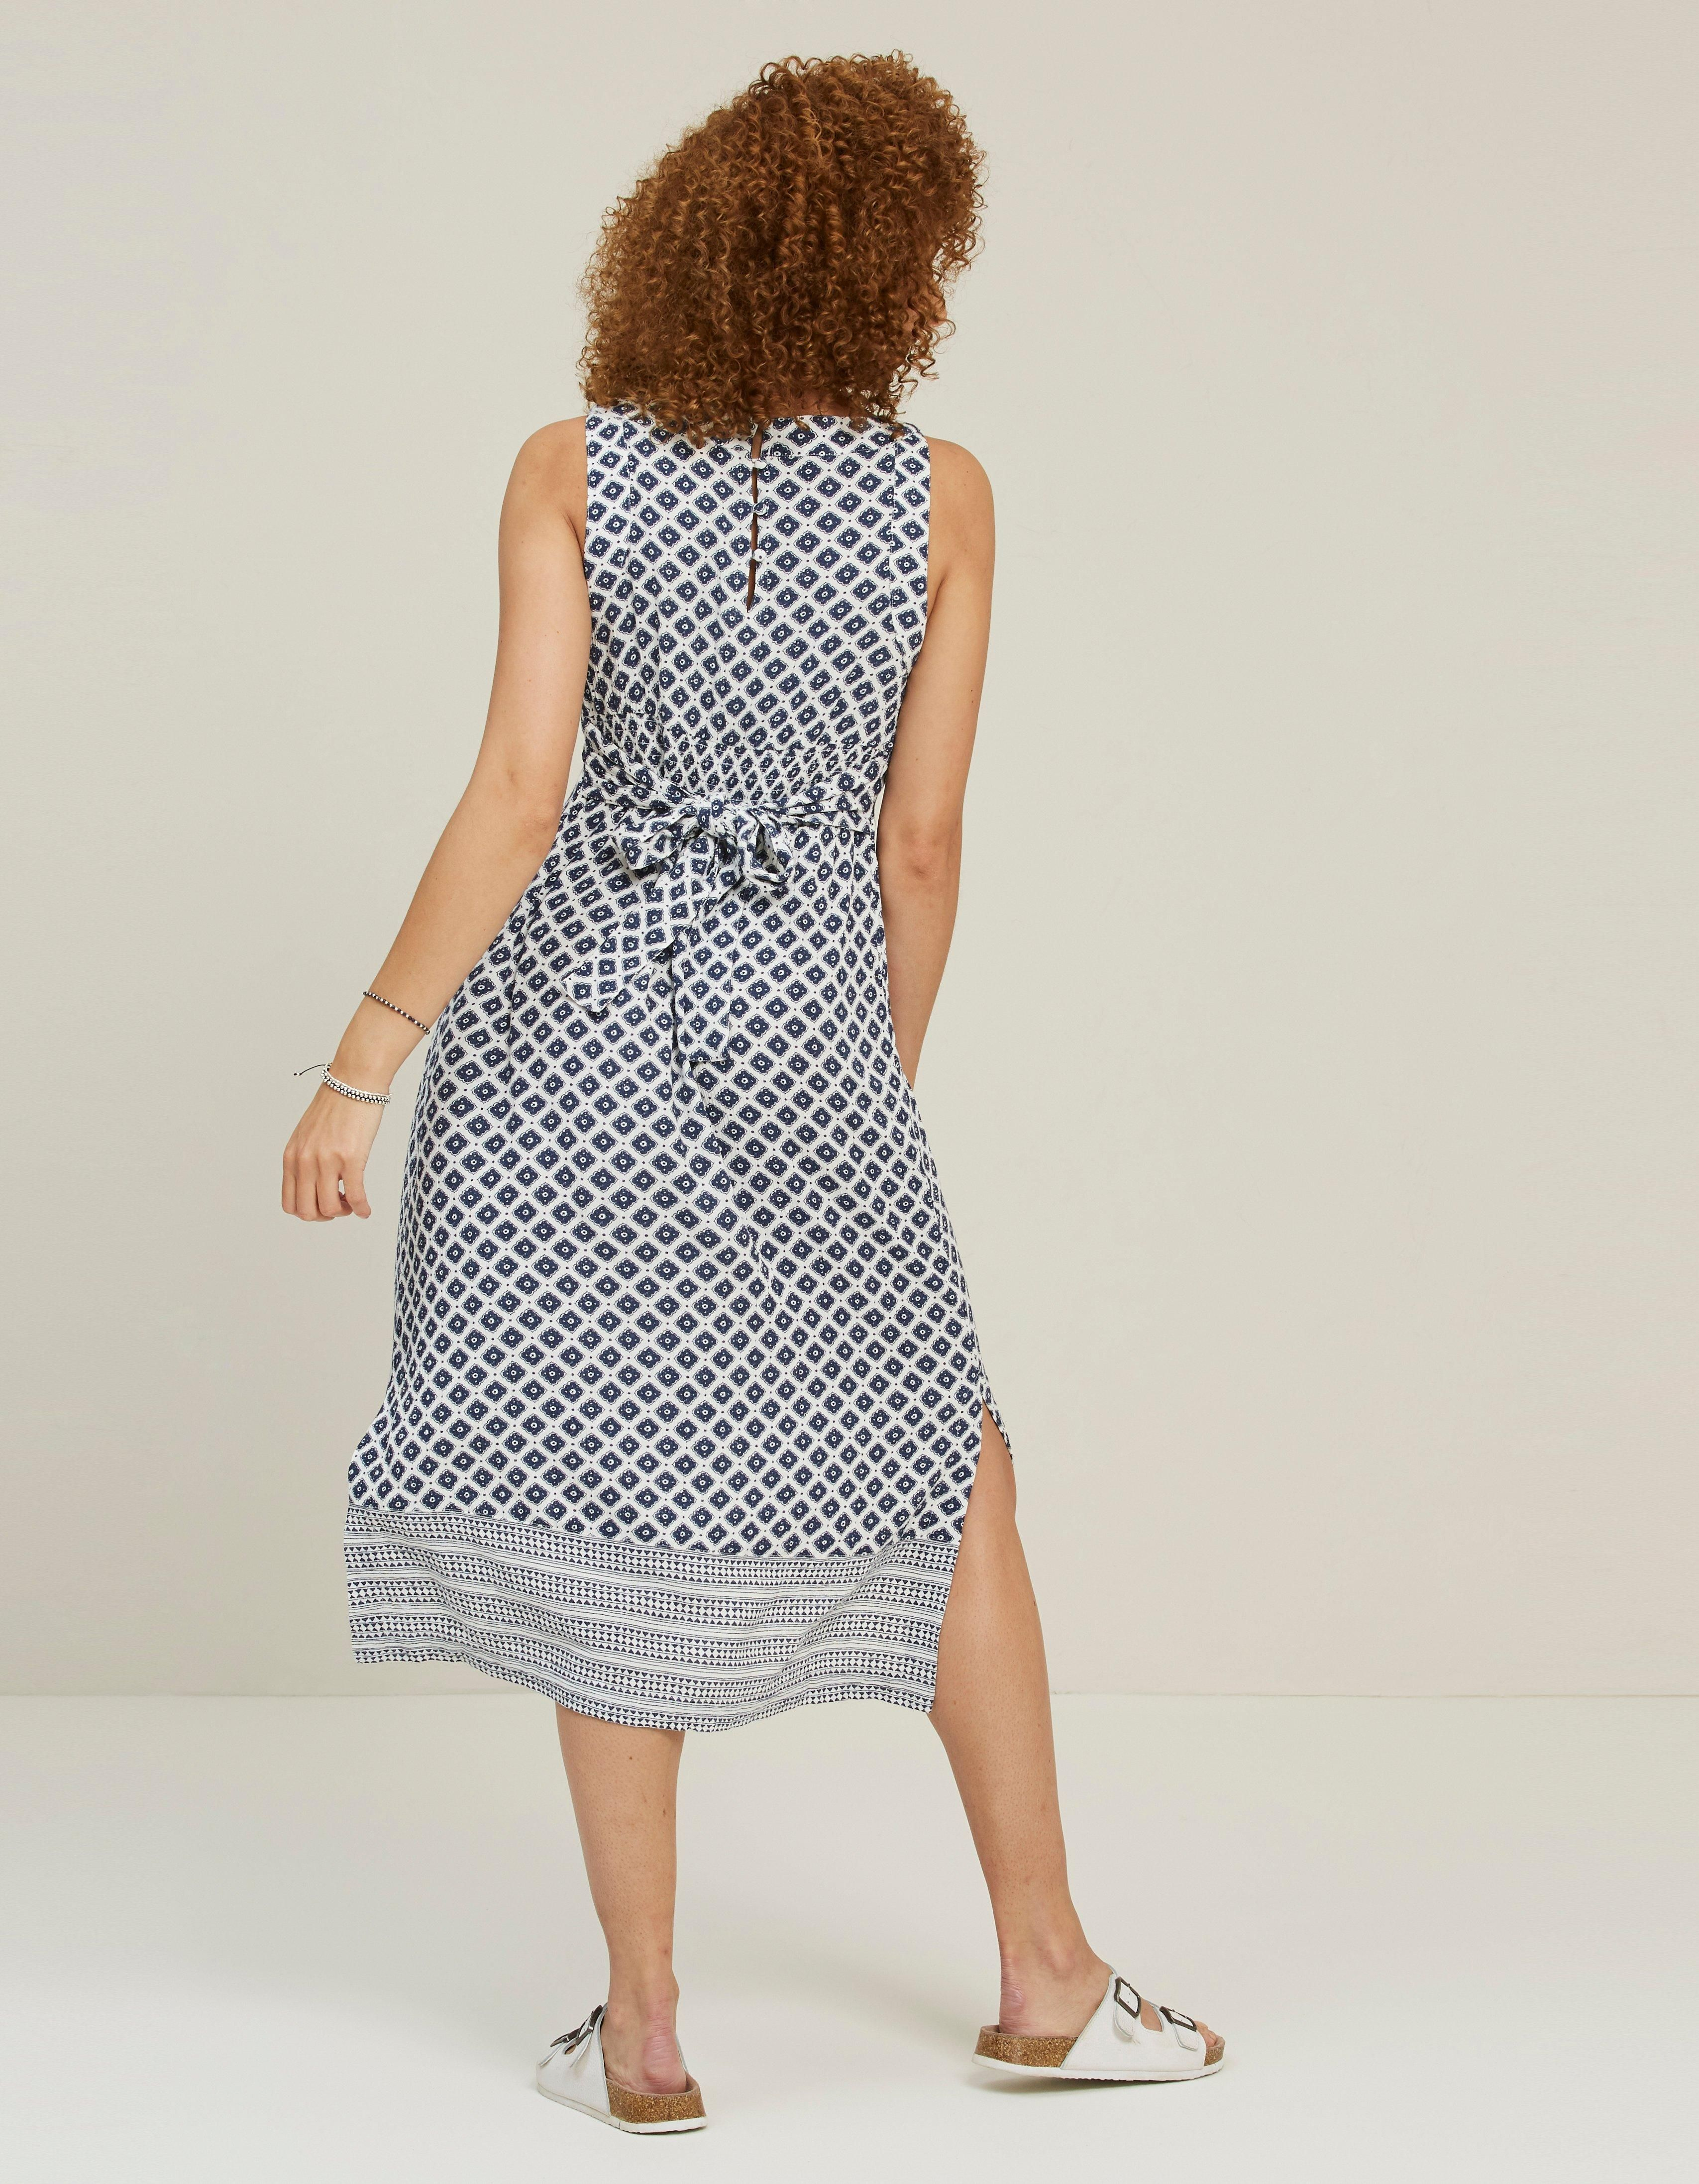 Ivory Laurie Vintage Geo Midi Dress Dresses Fatface Com Ad Vintage Ad Geo Ivory Laurie Clothes For Women Geo Dress Chambray Shirt Dress [ 4389 x 3414 Pixel ]